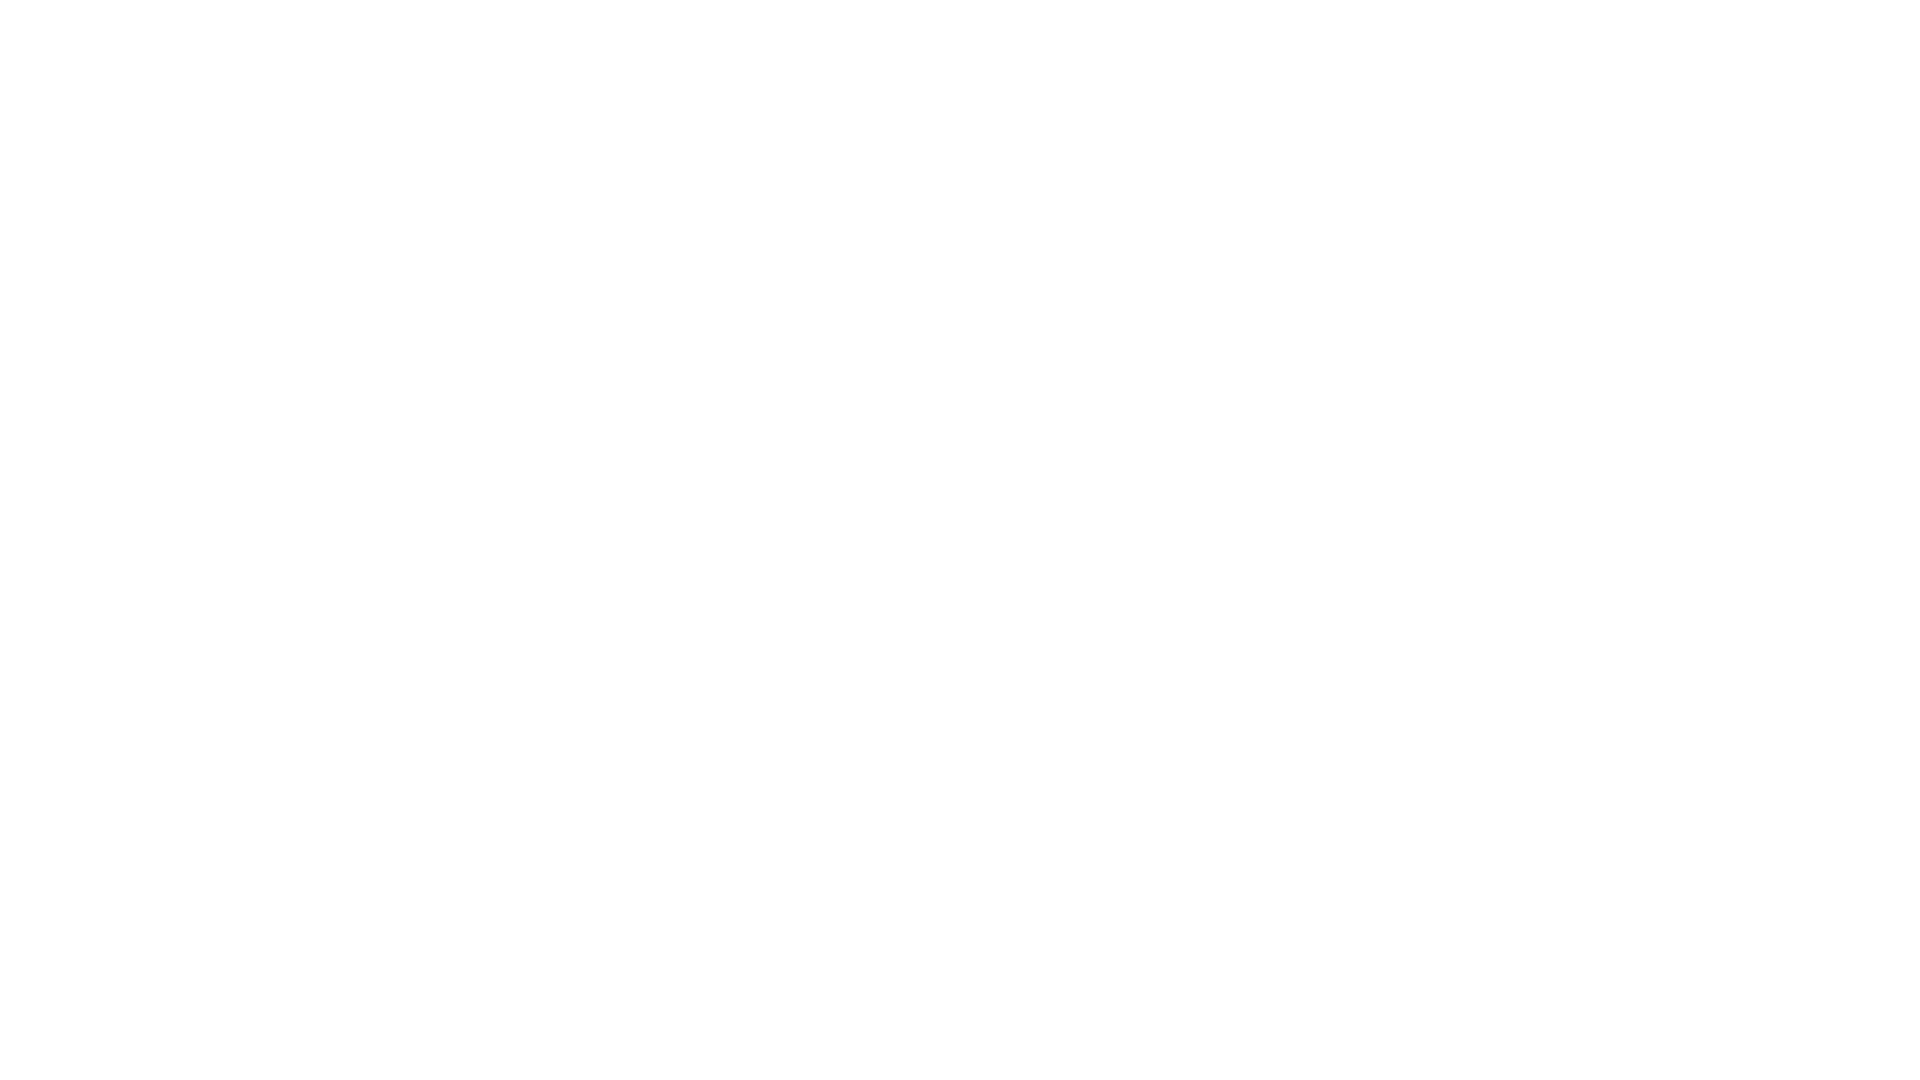 LPG ガラスコンロ 3 バーナーガスストーブ真鍮 + 赤外線